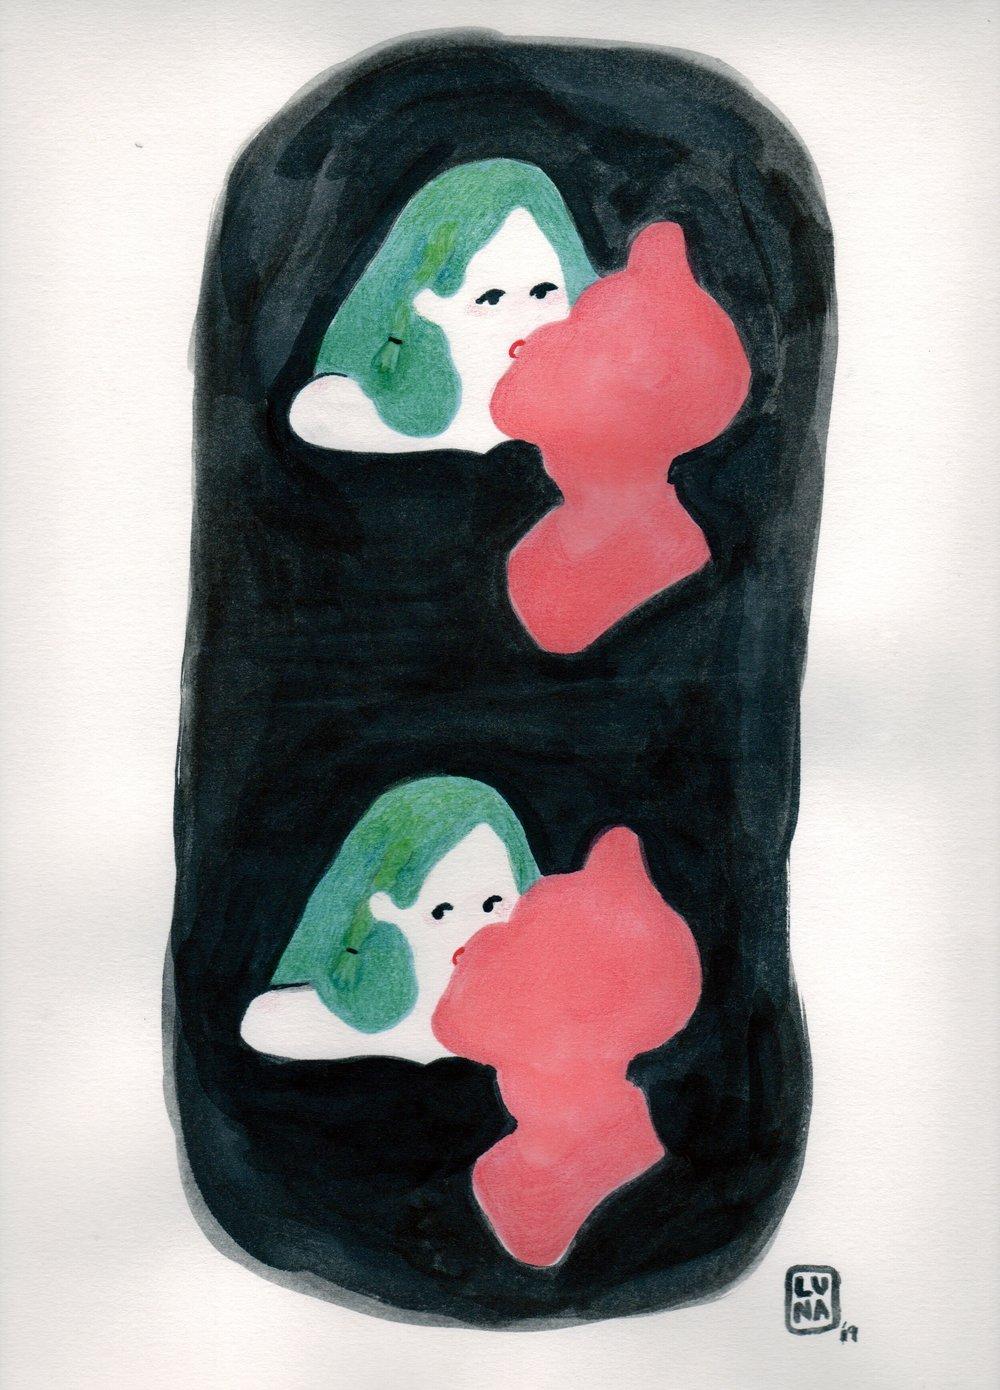 Art by Luna Doherty-Ryoke